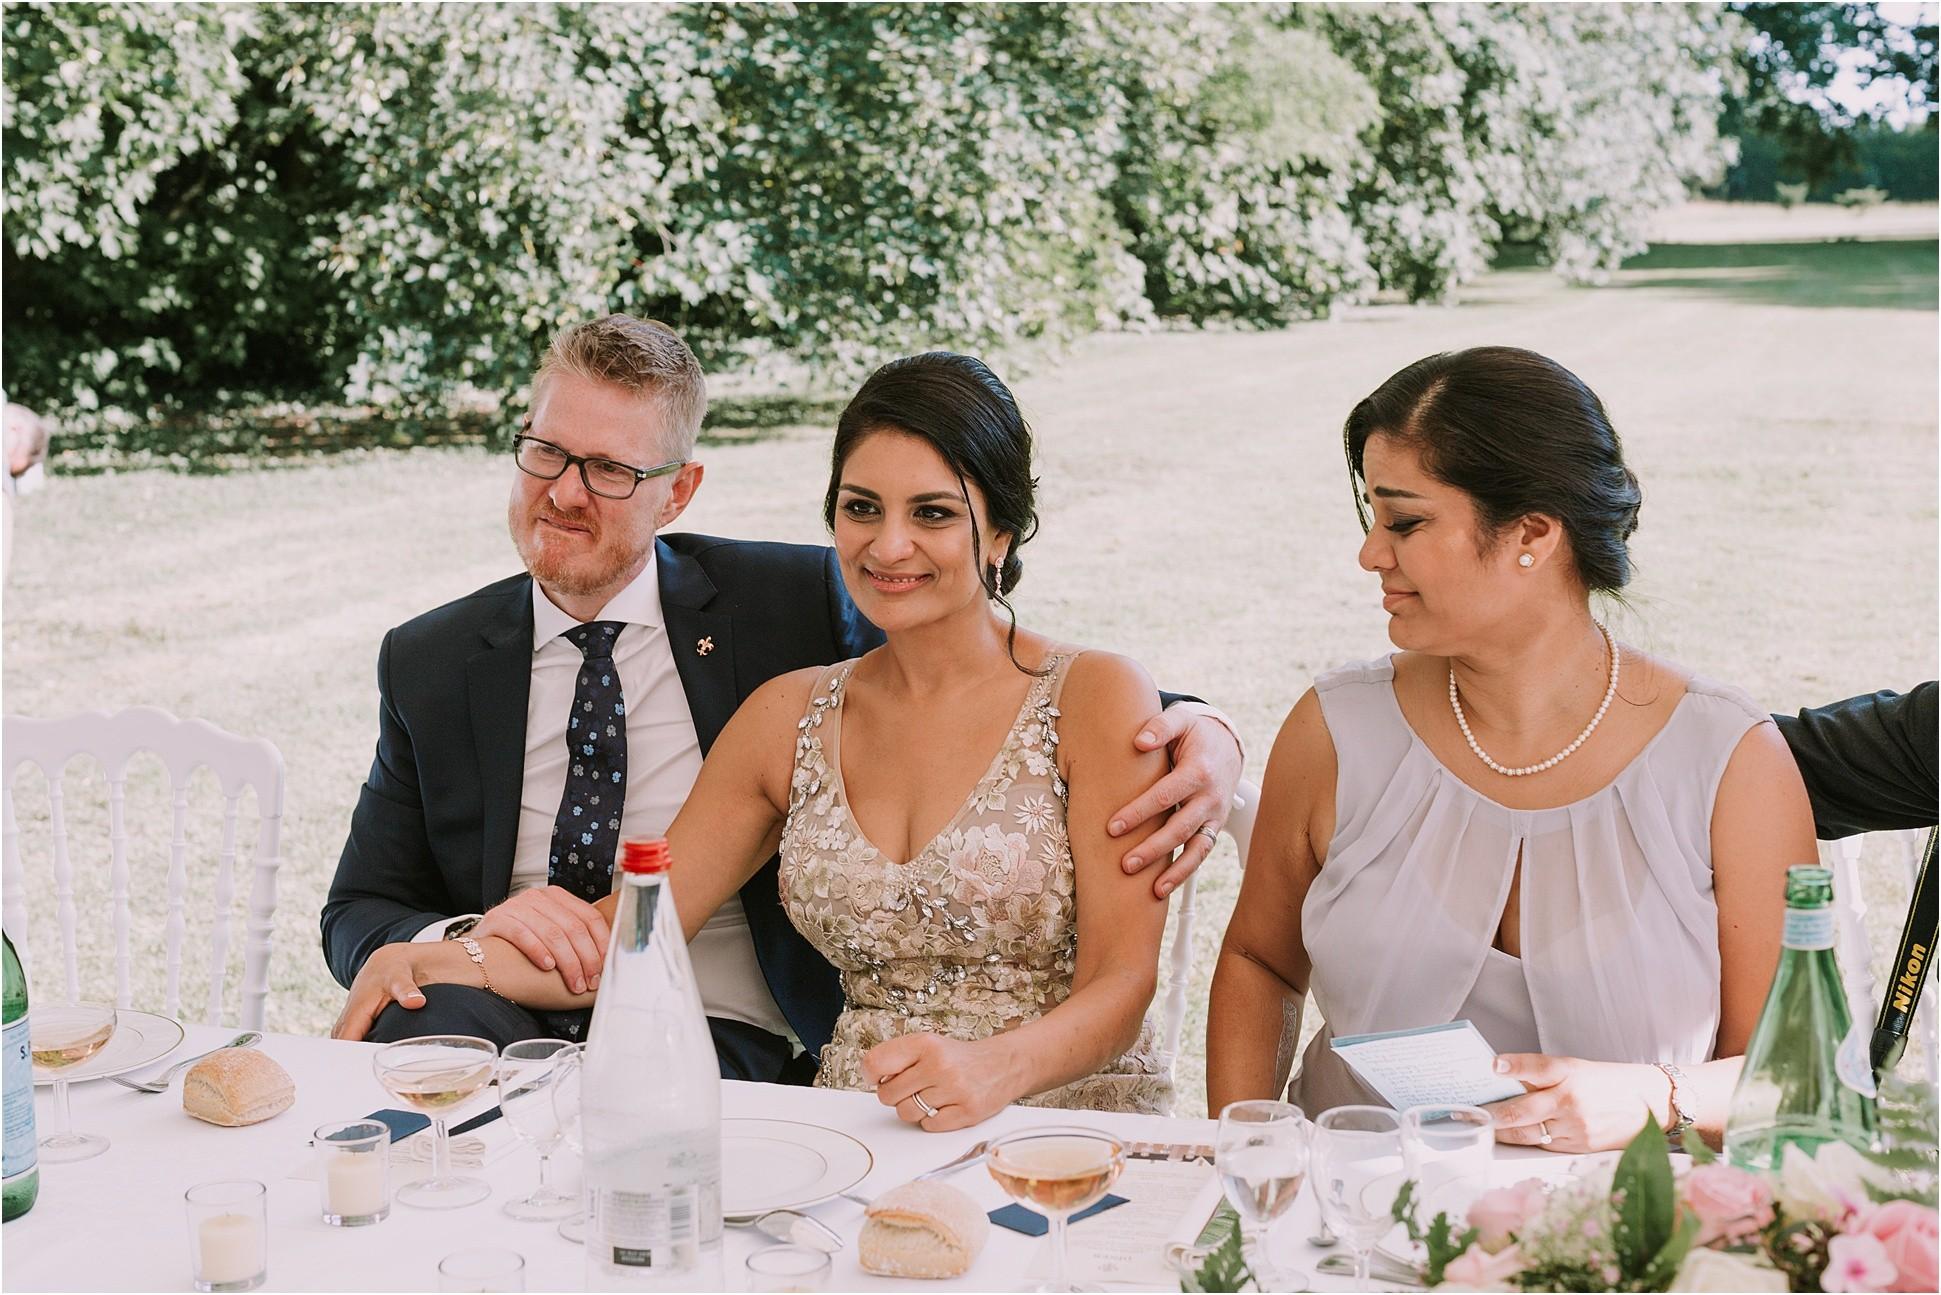 Kateryna-photos-photographe-mariage-chateau-st-paterne-mayenne-normandie_0148.jpg